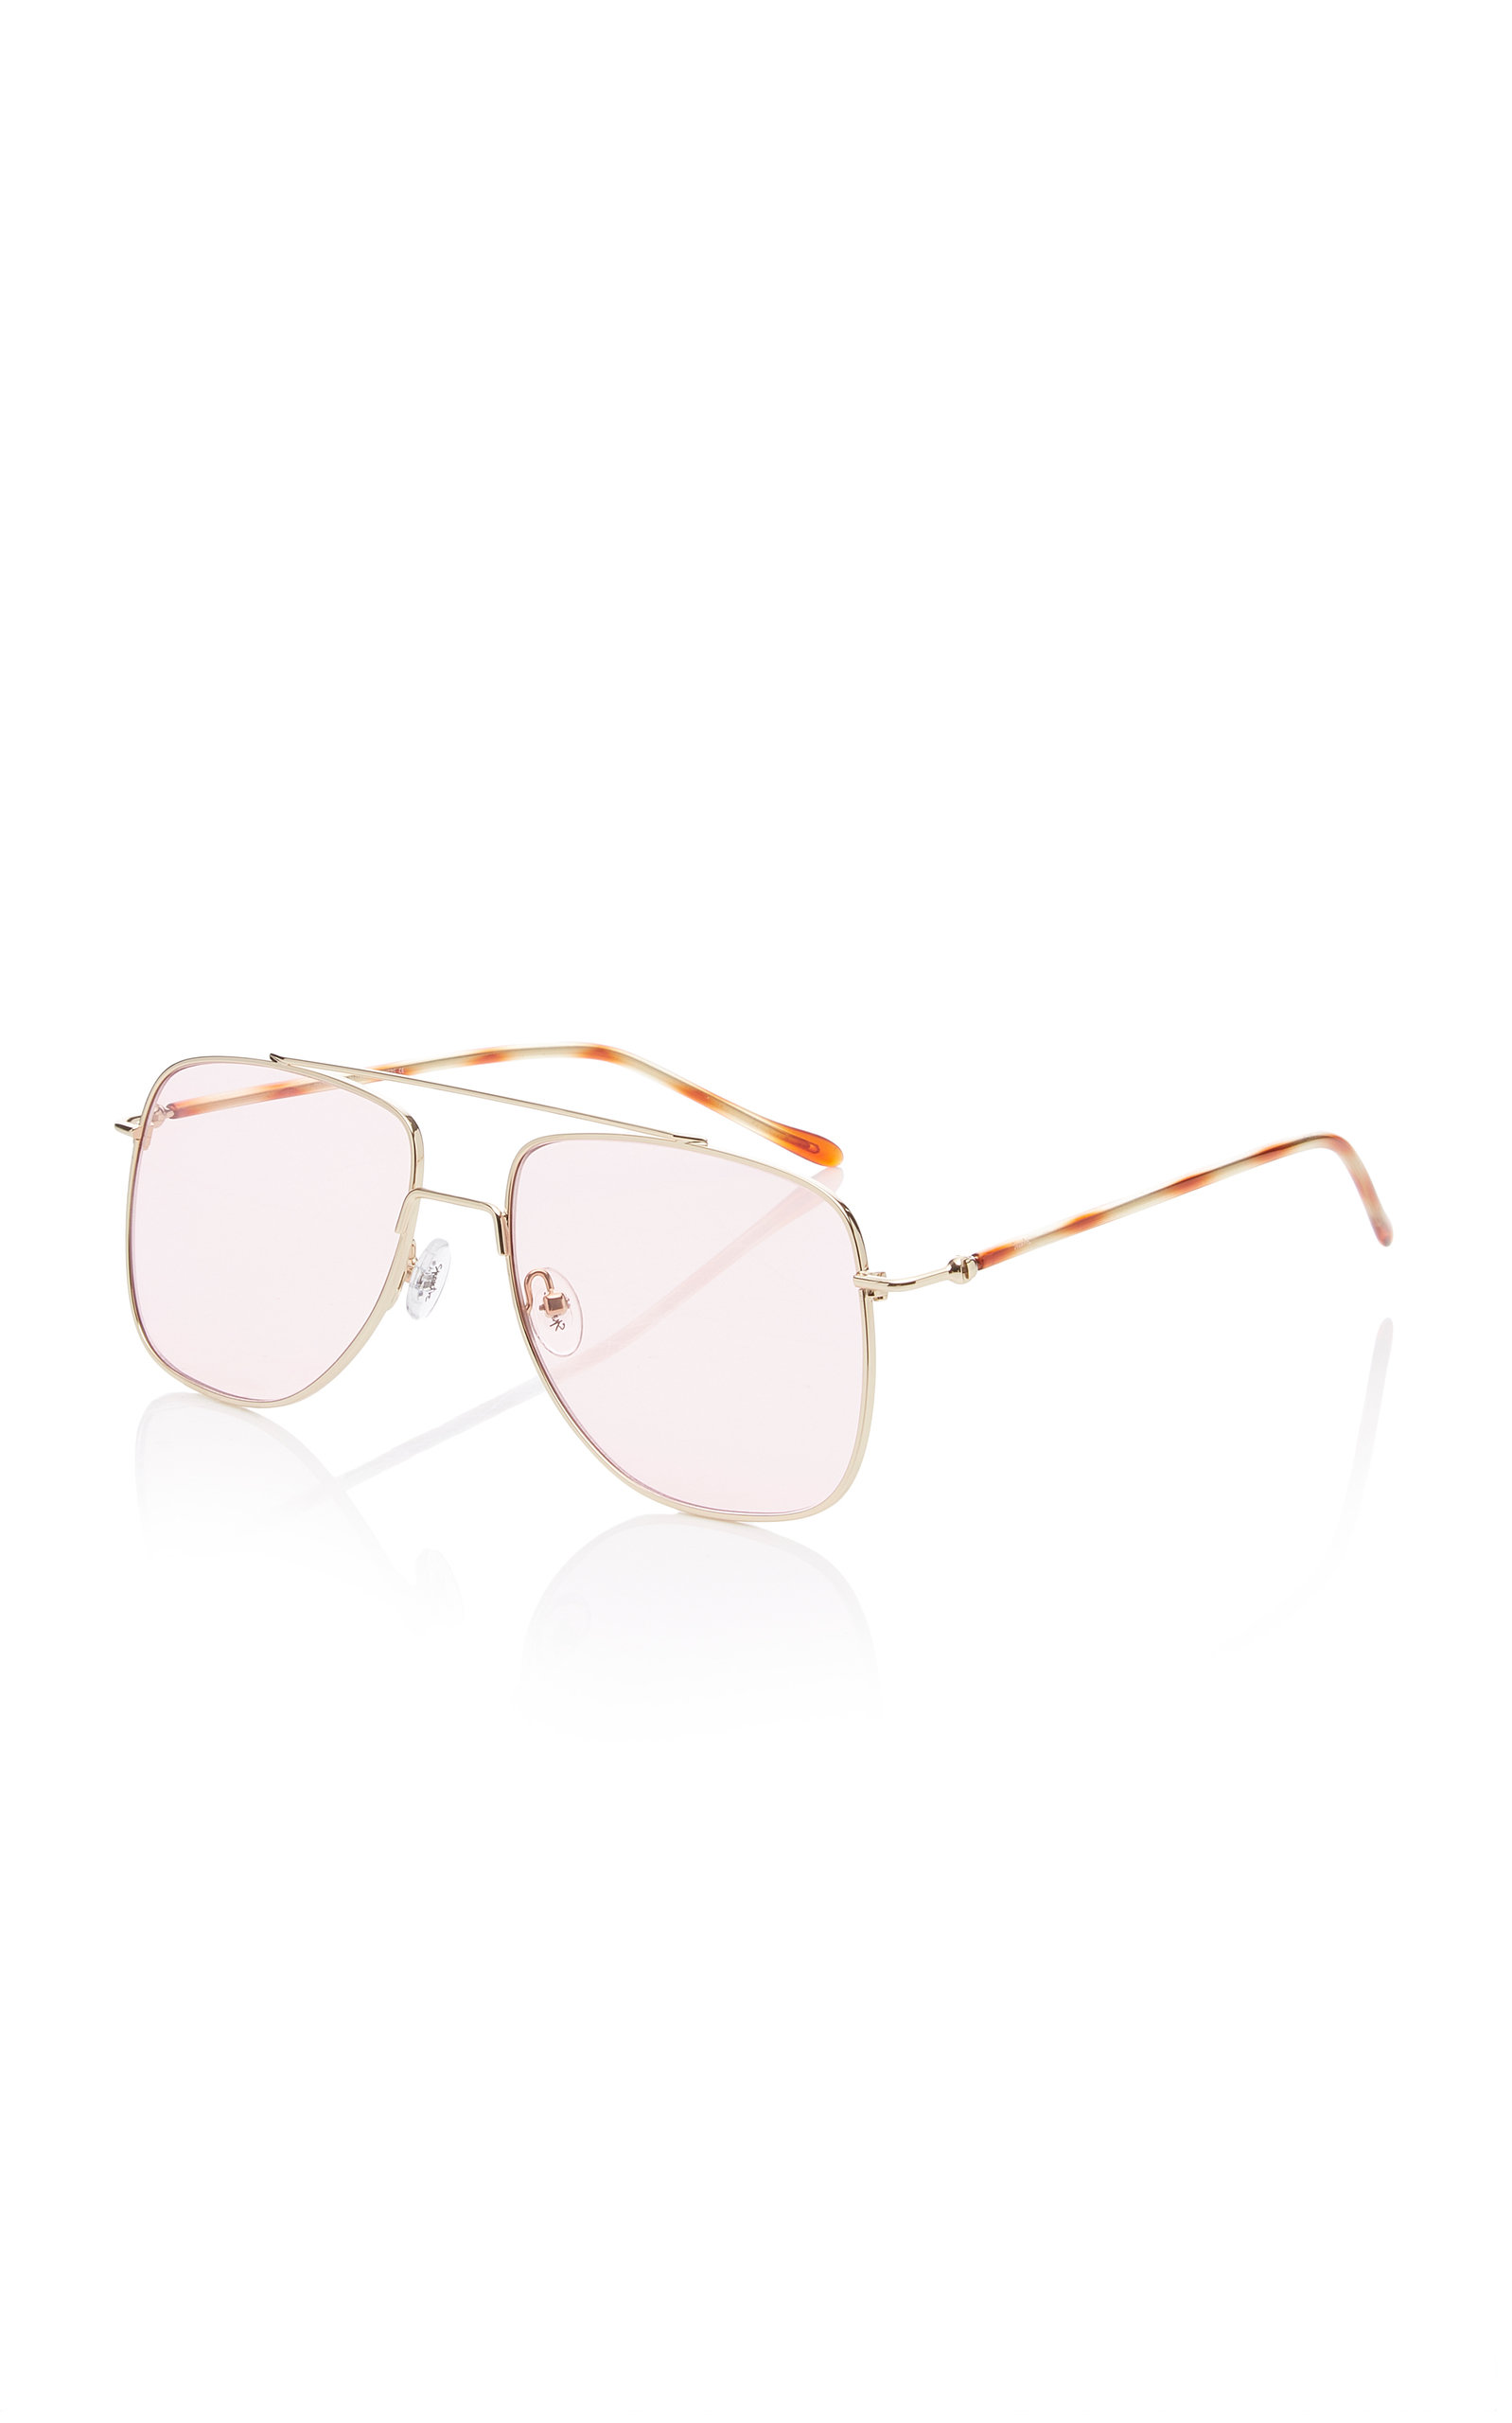 8e0983b5a SpektreMaranello Aviator-Style Silver-Tone Sunglasses. CLOSE. Loading.  Loading